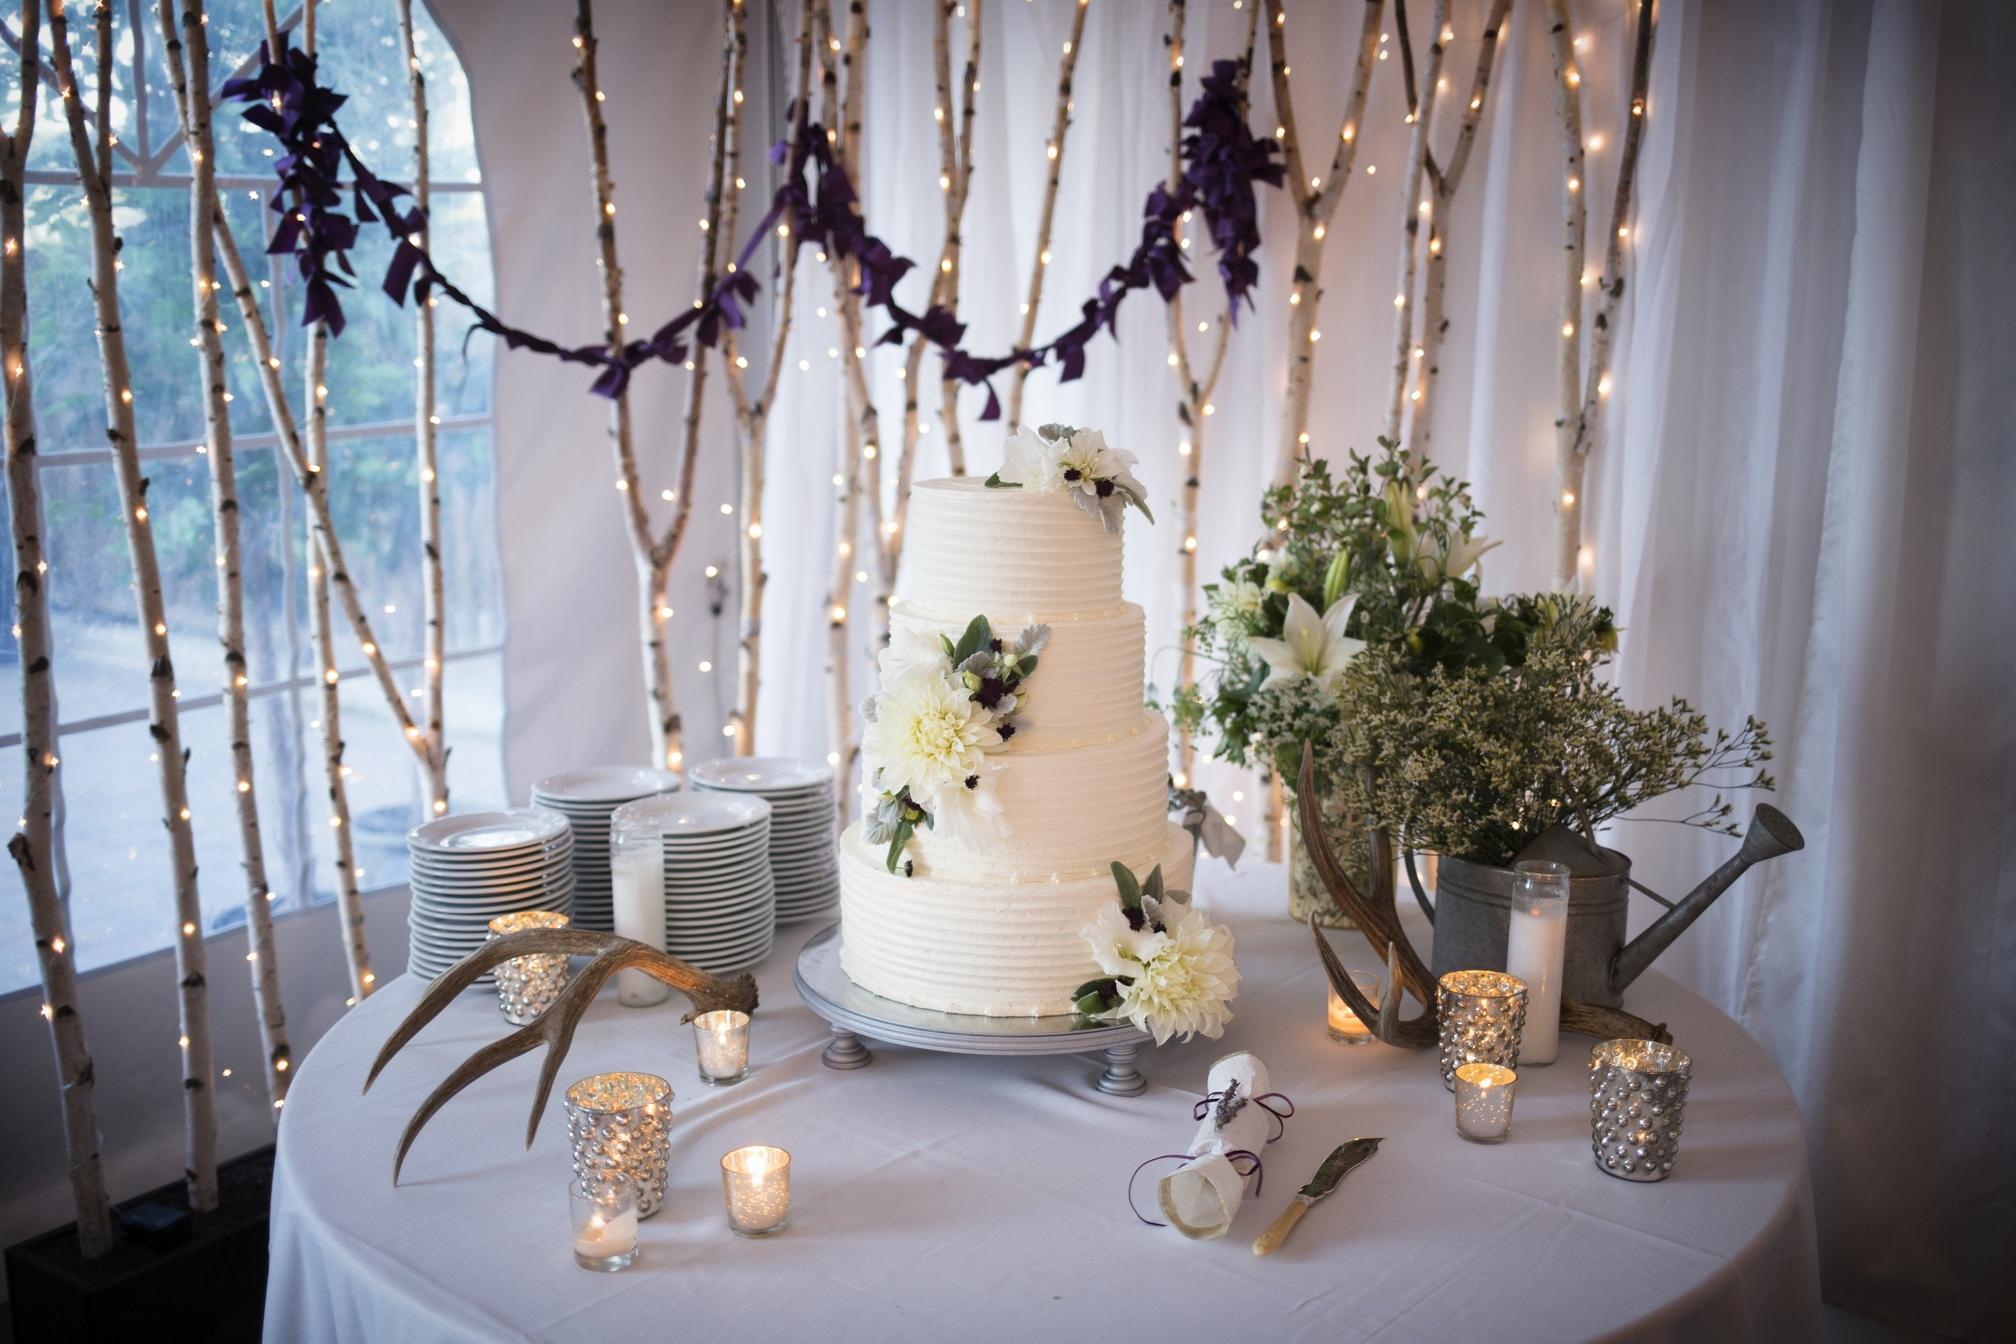 Millett Wedding Jackson Hole 2104_0415A.JPG